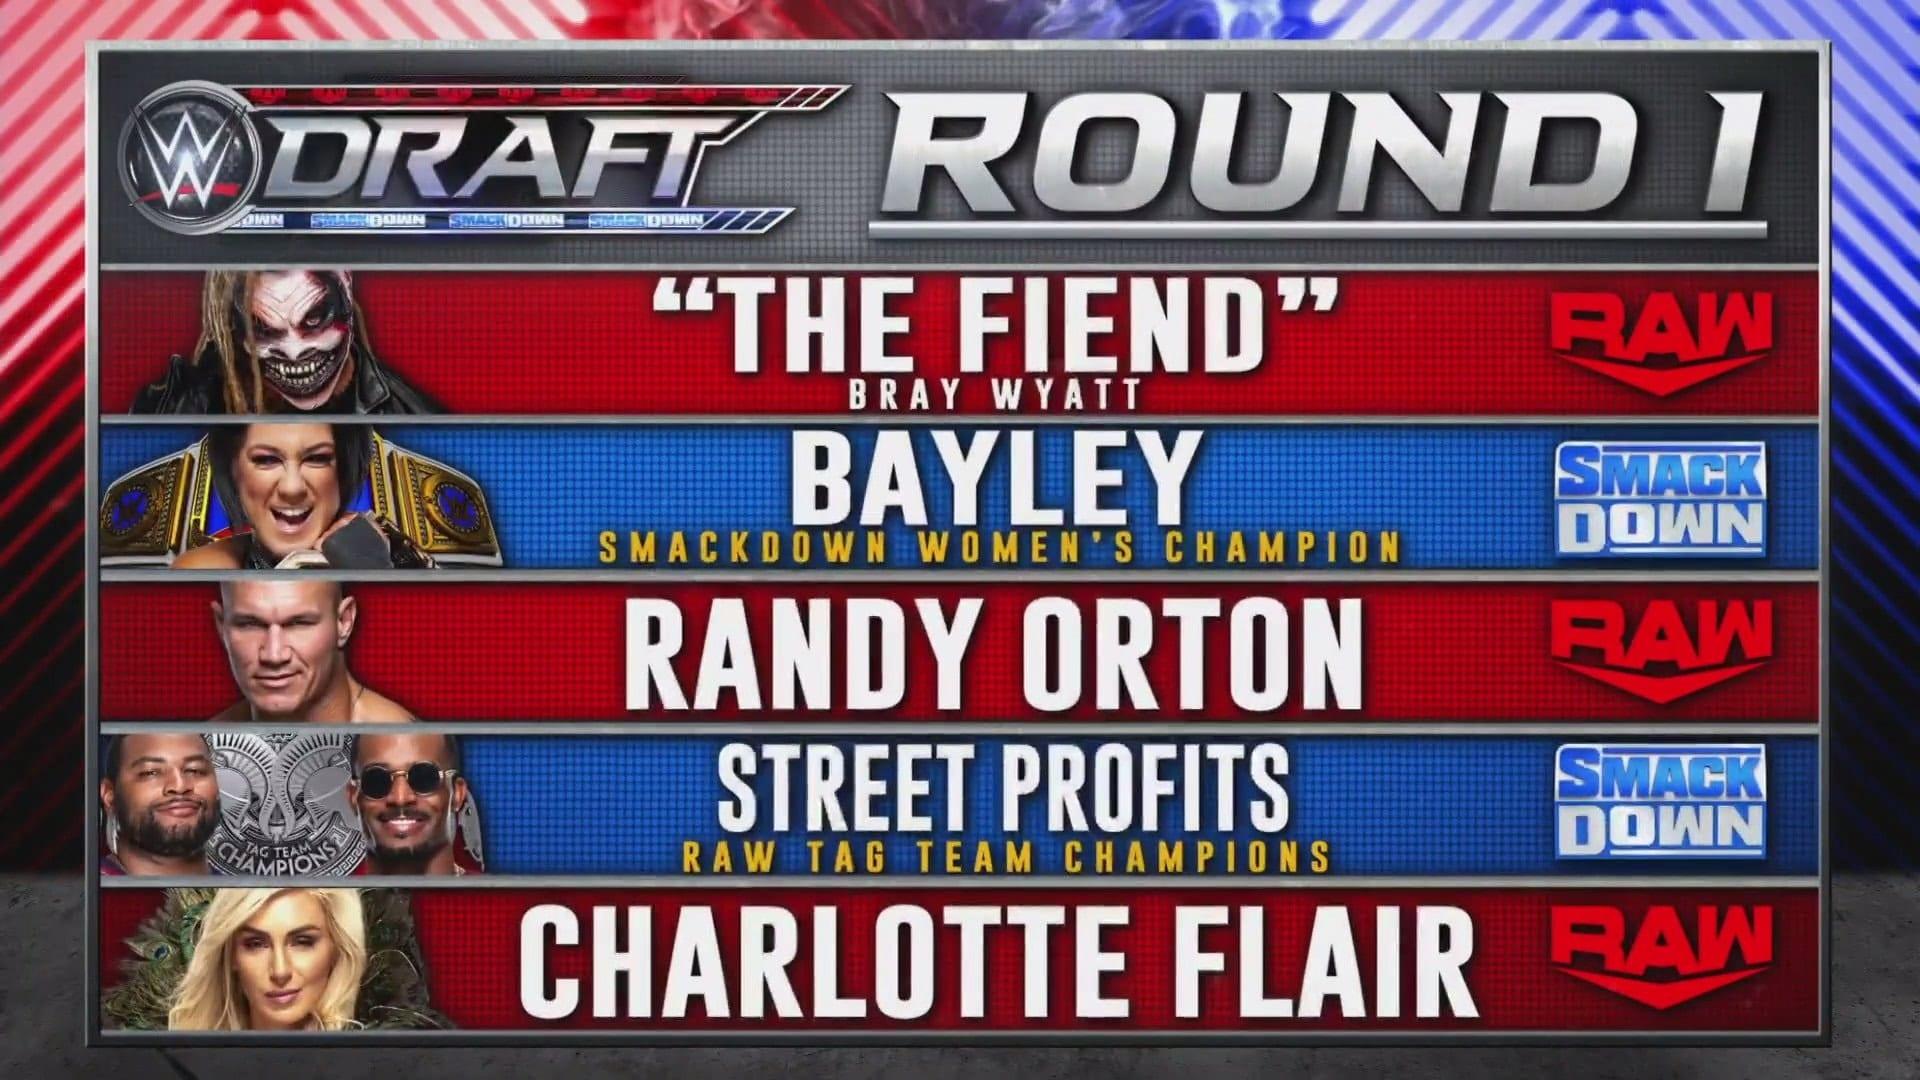 The Fiend Bray Wyatt Drafted To RAW